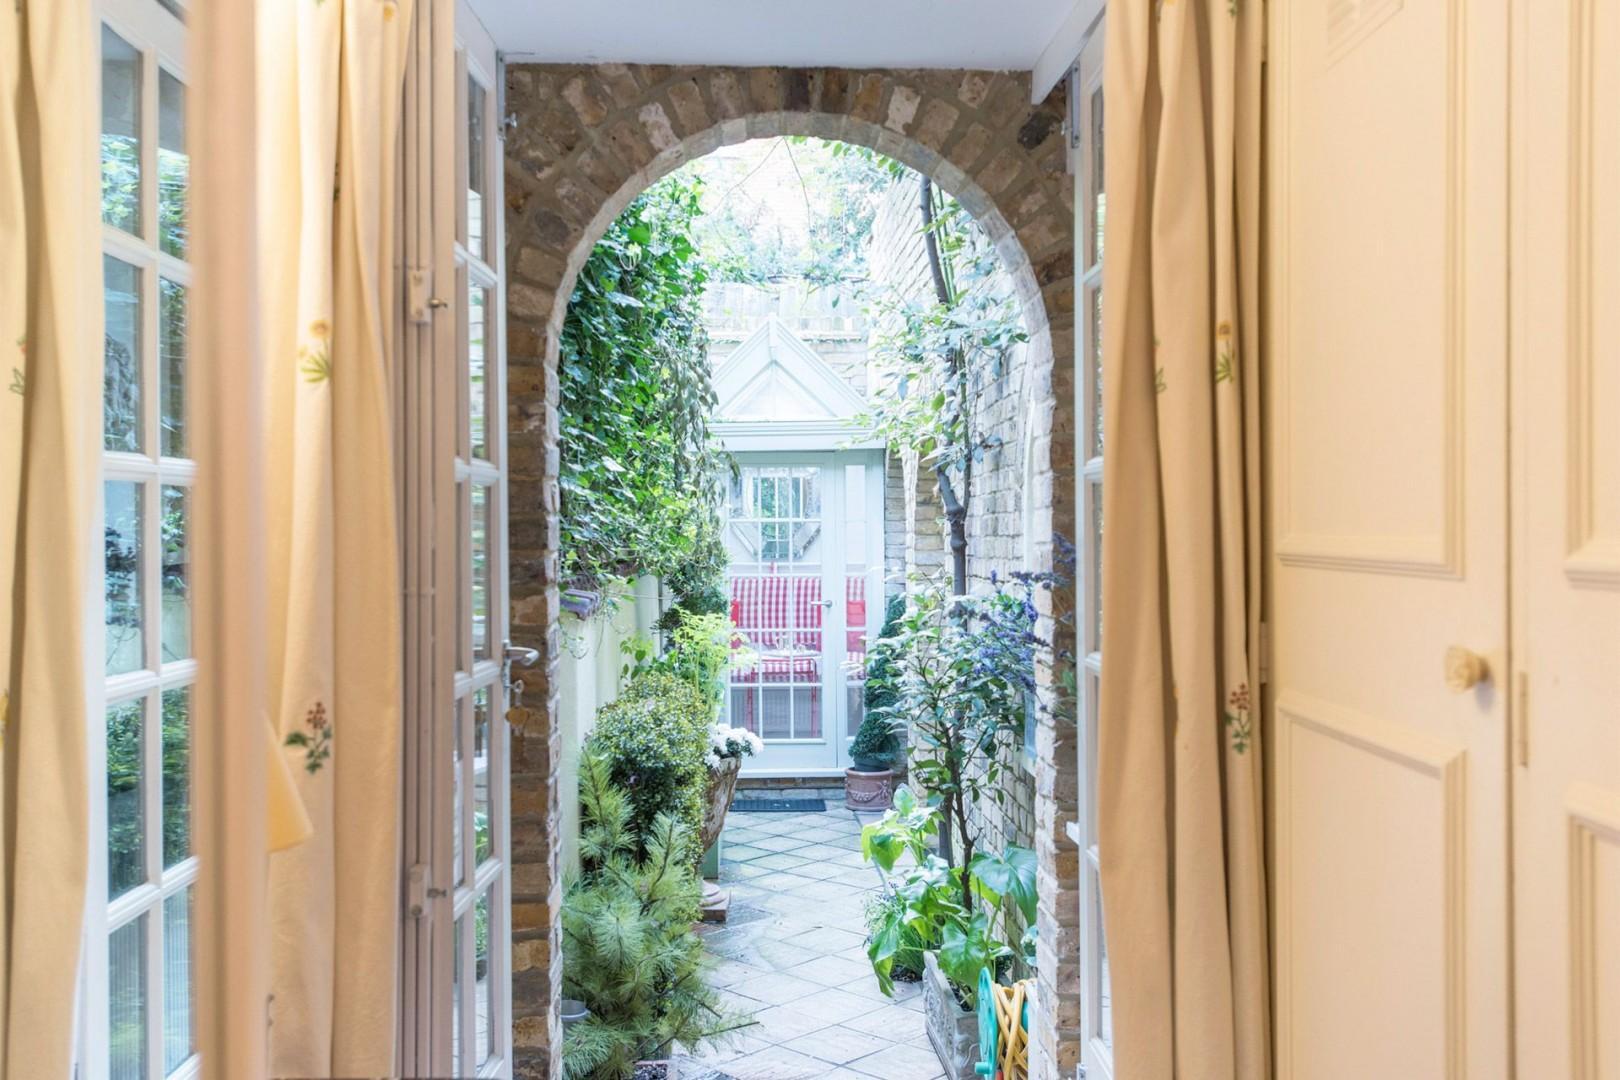 Corridor leading to bathroom, bedroom and private garden